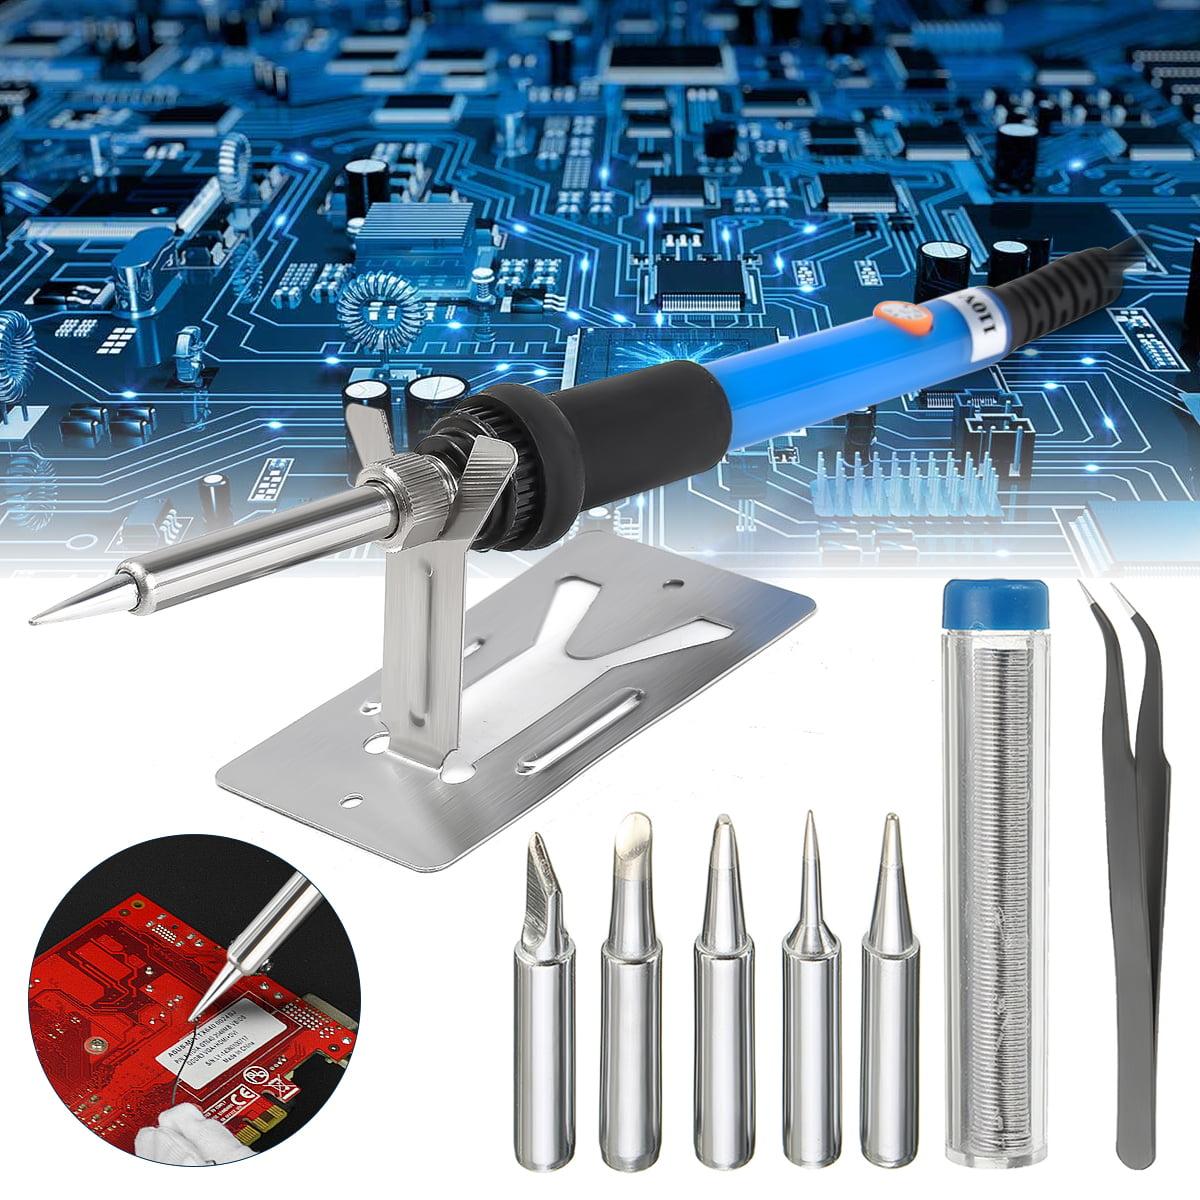 Adjustable Electric Temperature Gun Welding Soldering Iron Tool Kit Set 60W BP